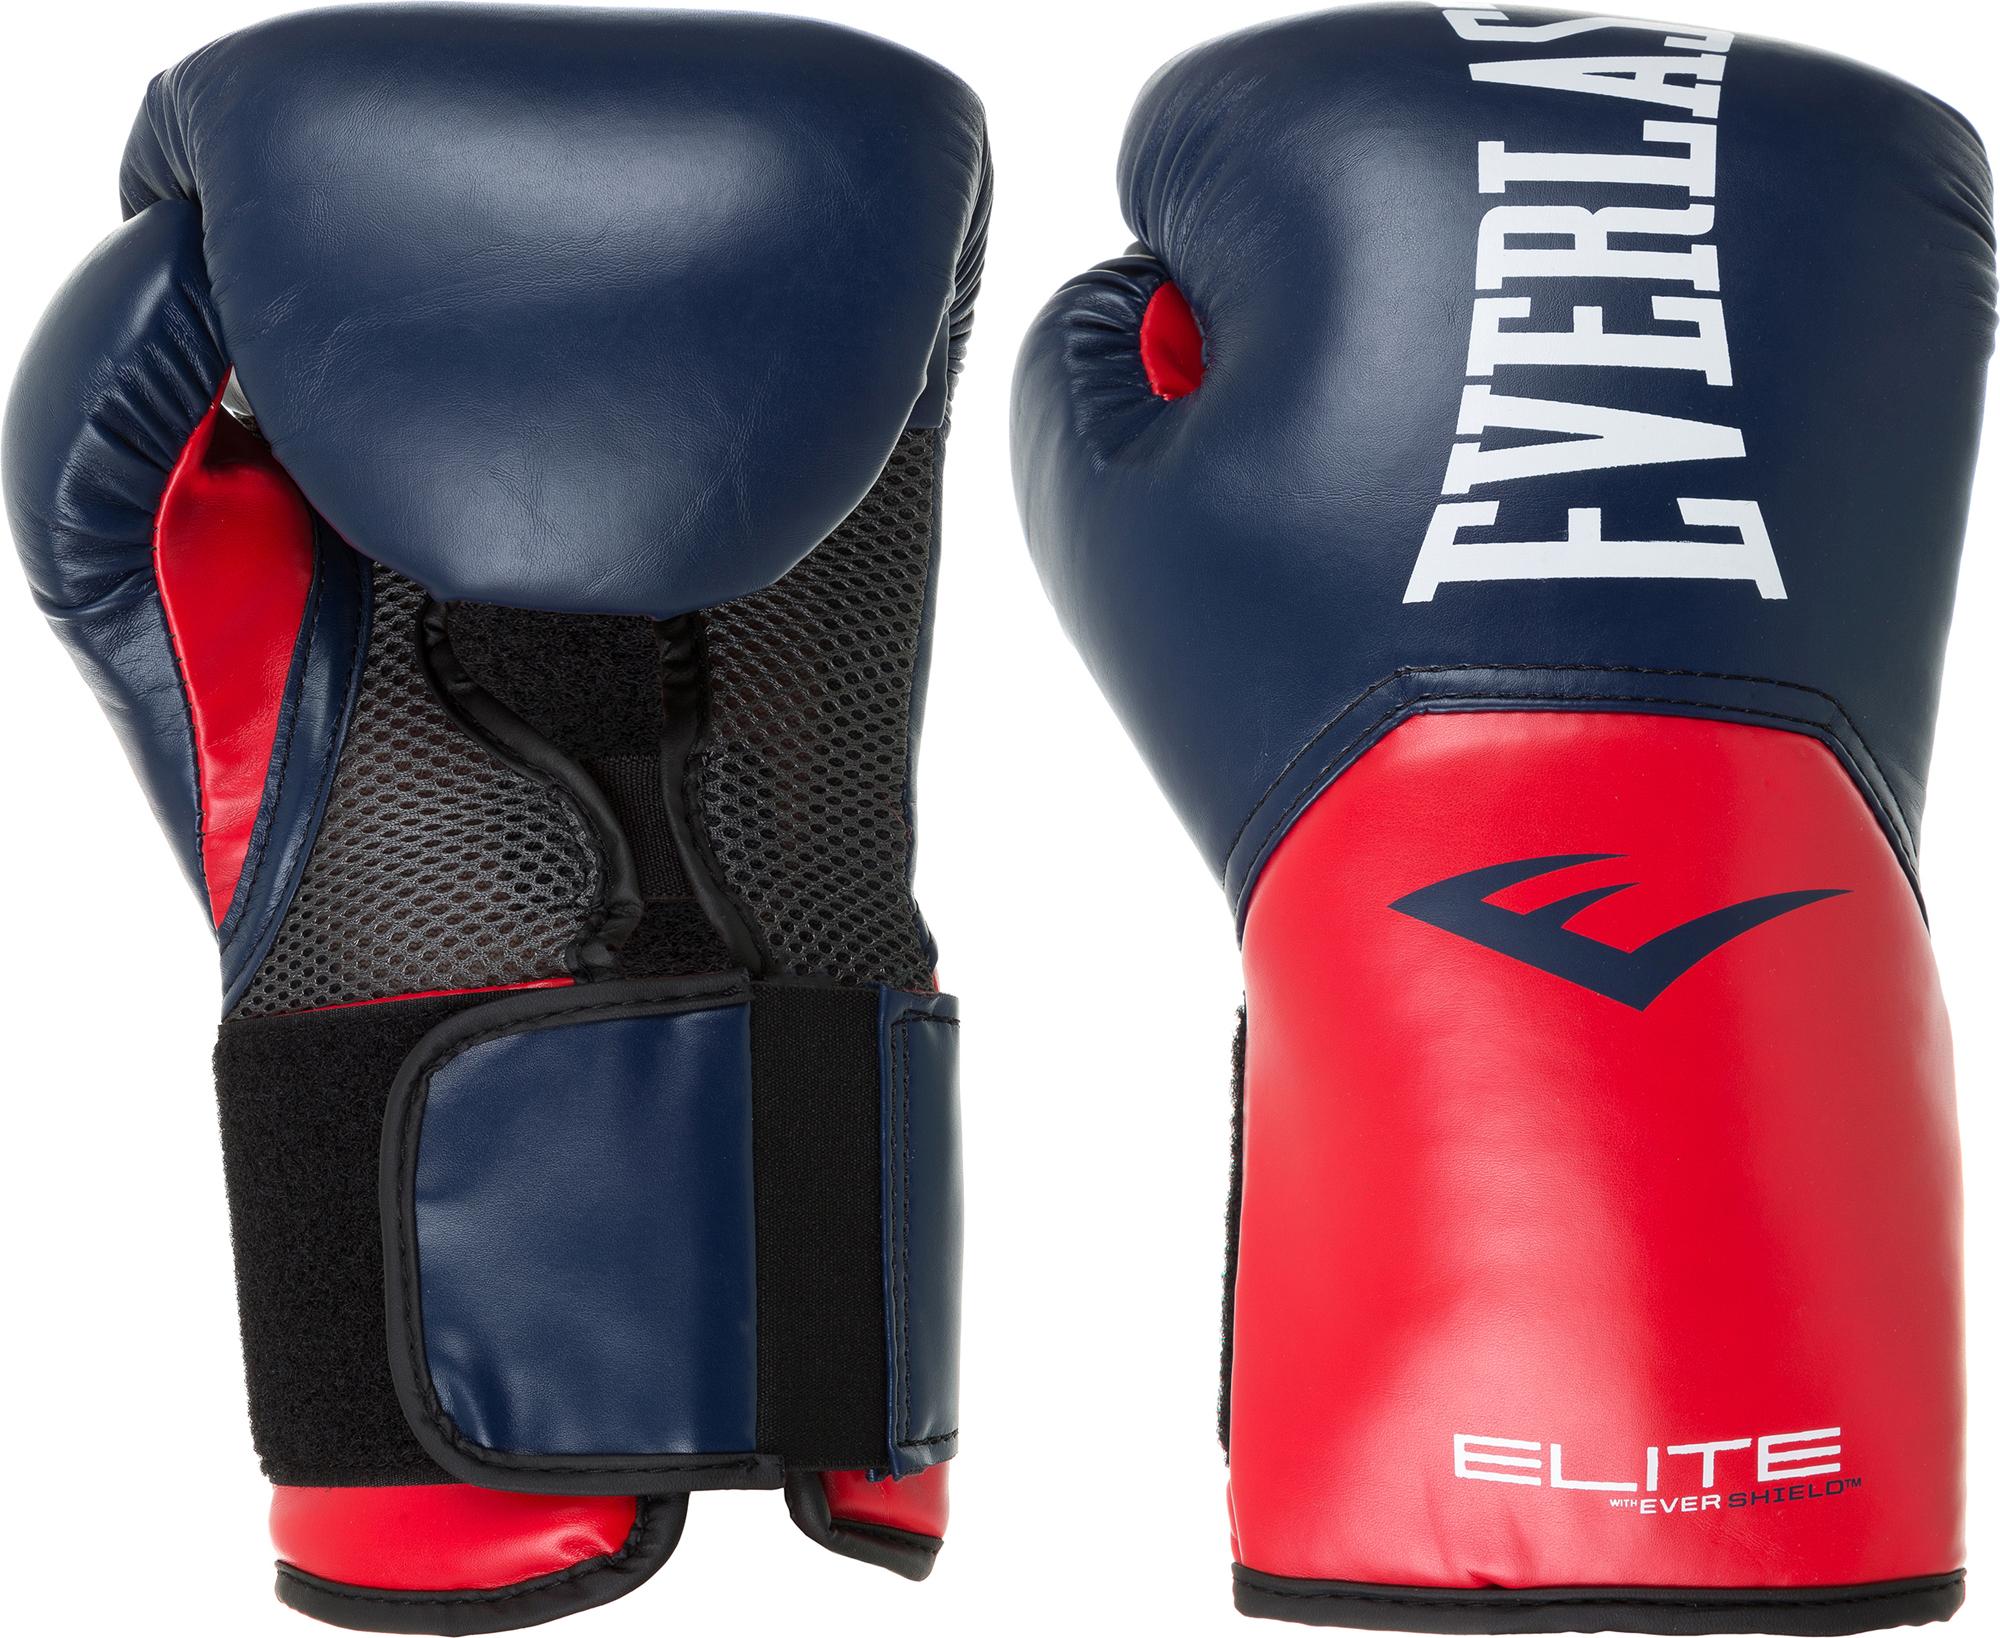 цена на Everlast Перчатки боксерские Everlast, размер 14 oz